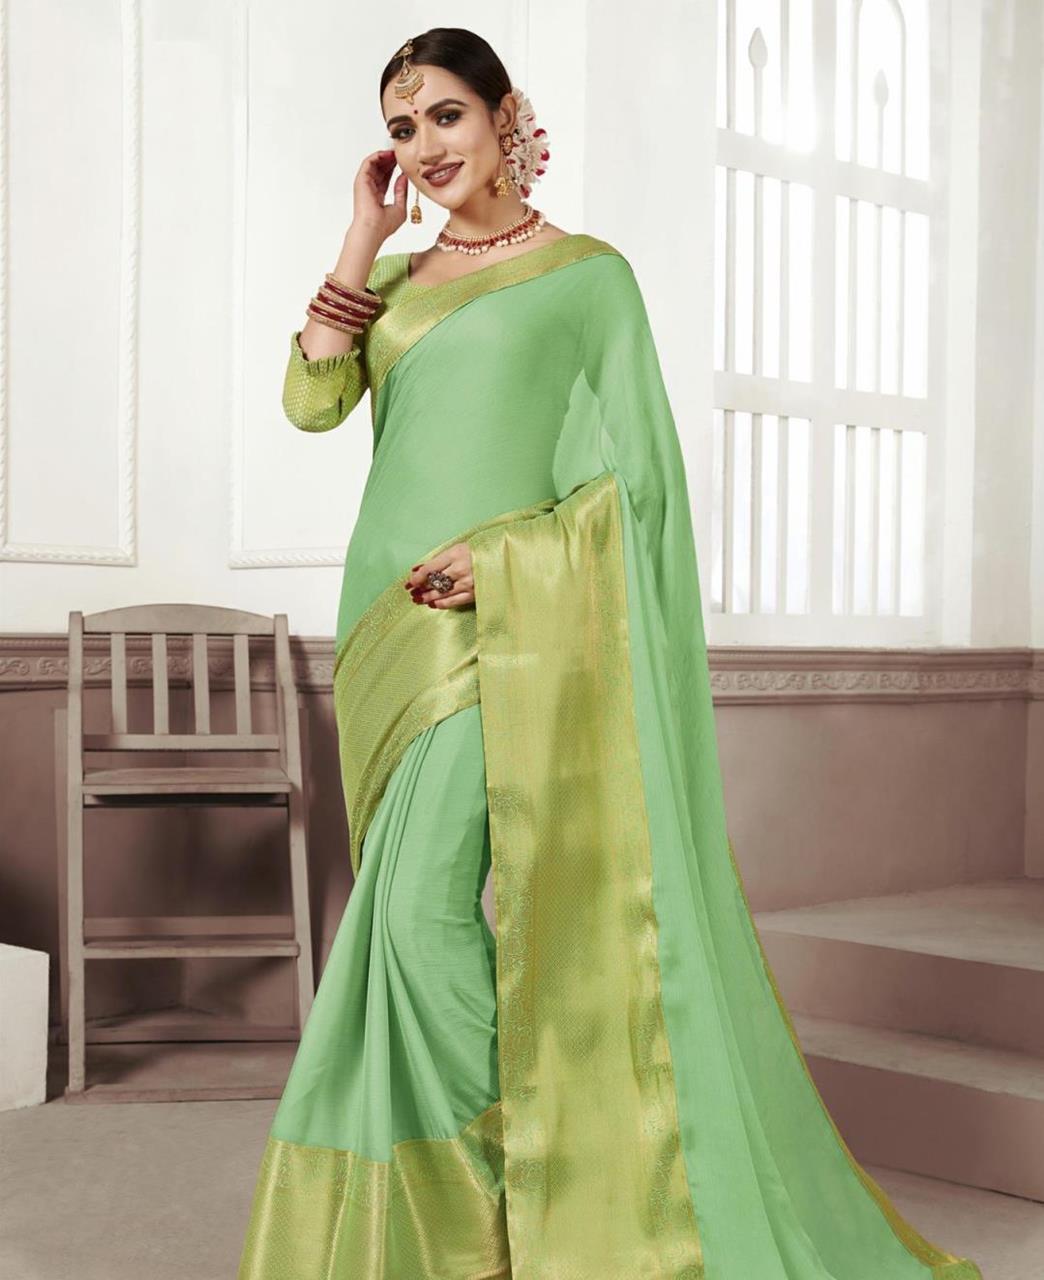 Woven Chiffon Saree (Sari) in MINTCREAM